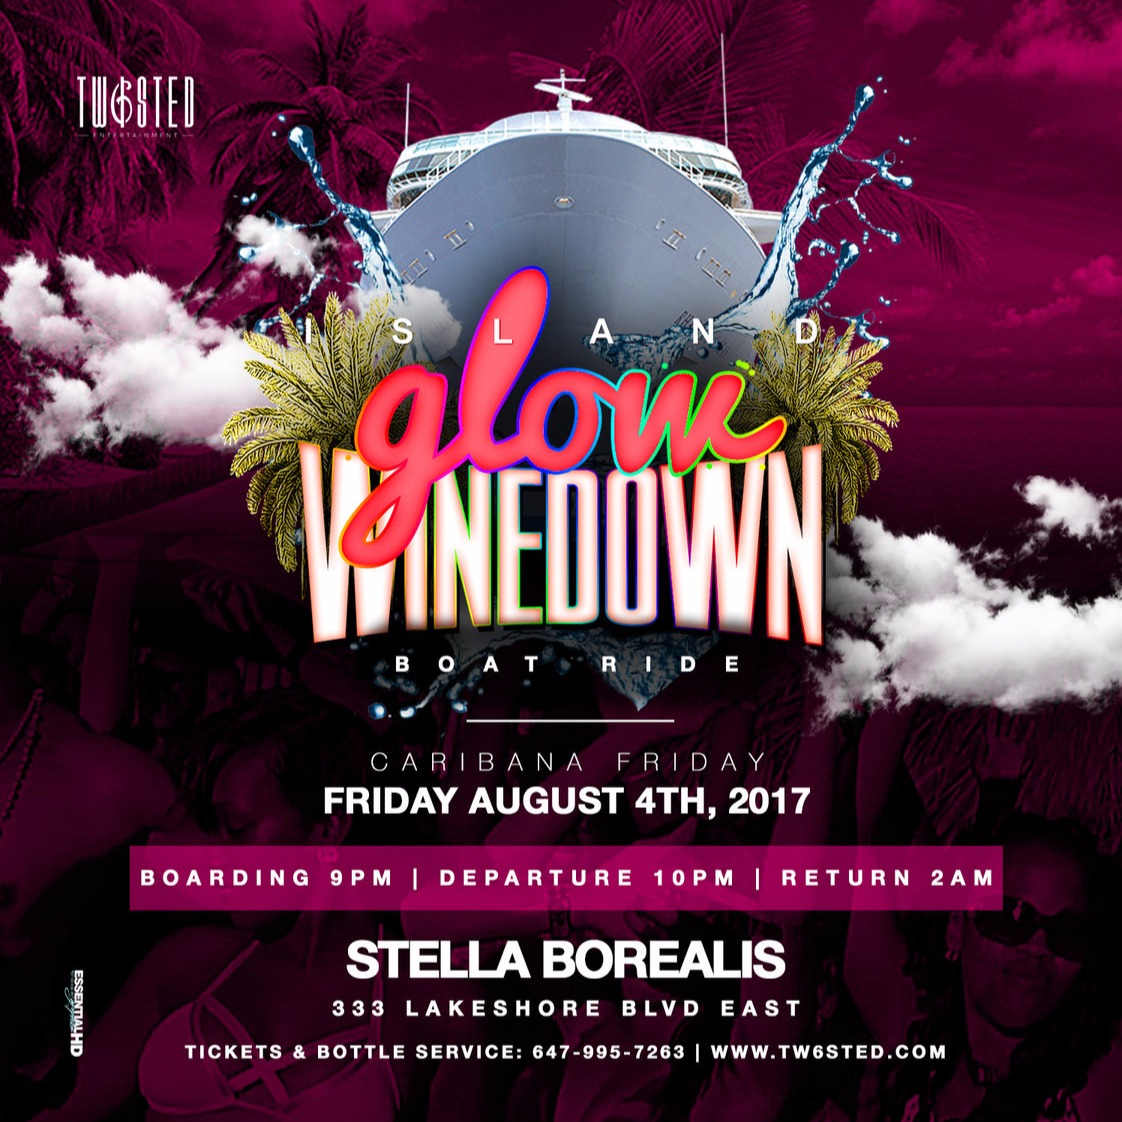 Island GLOW Winedown: Boat Cruise Edition | Caribana Friday | August 4th